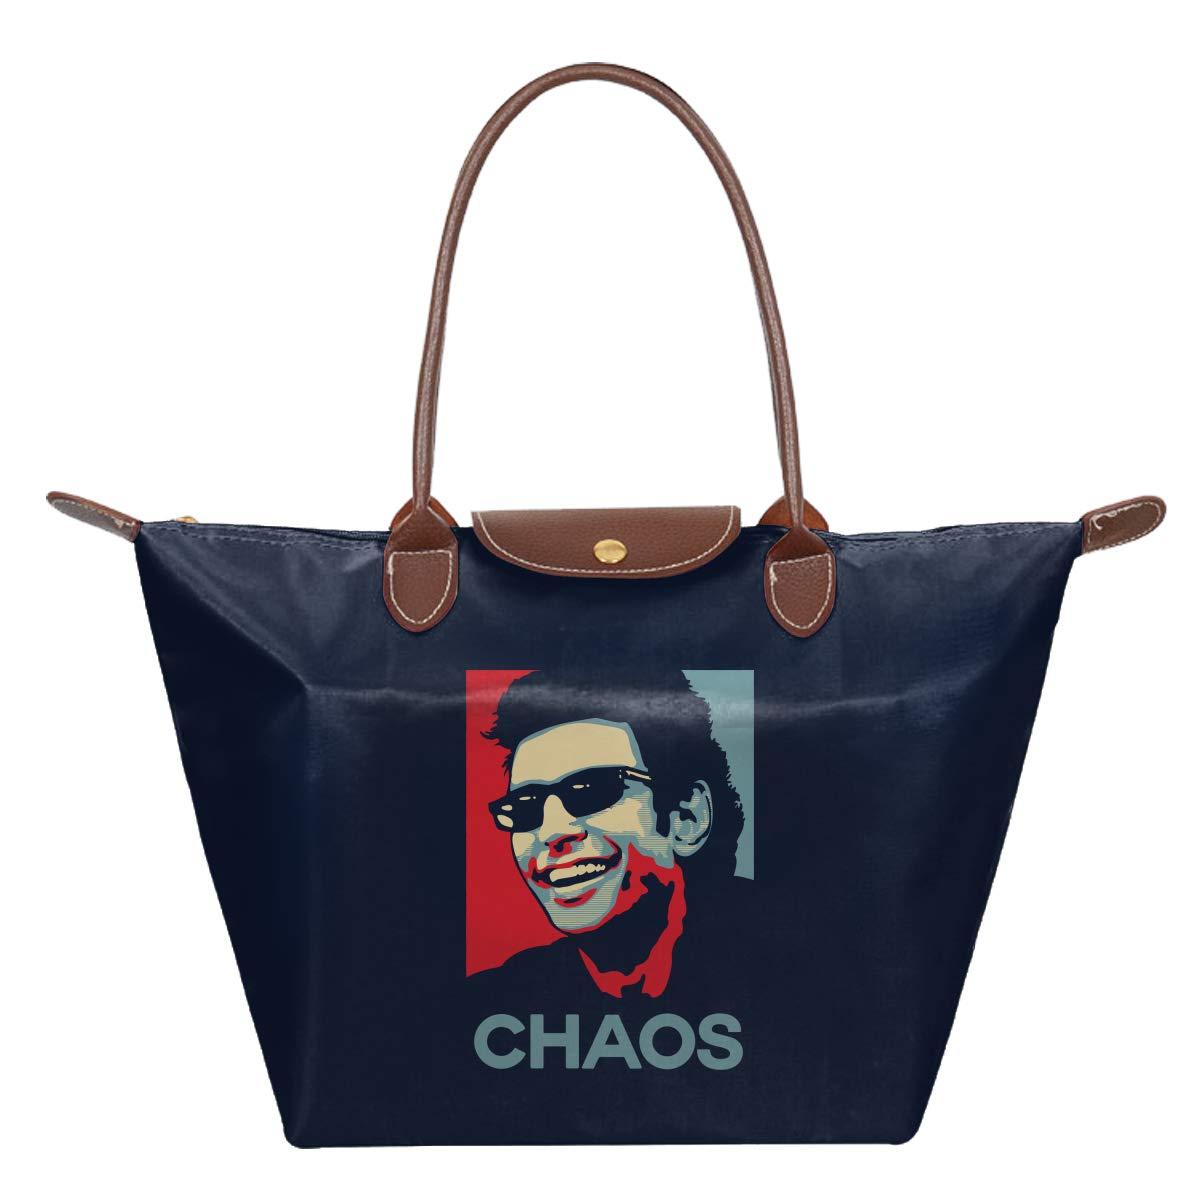 Ian Malcolm Chaos Theory Jurassic Park Hope Waterproof Leather Folded Messenger Nylon Bag Travel Tote Hopping Folding School Handbags